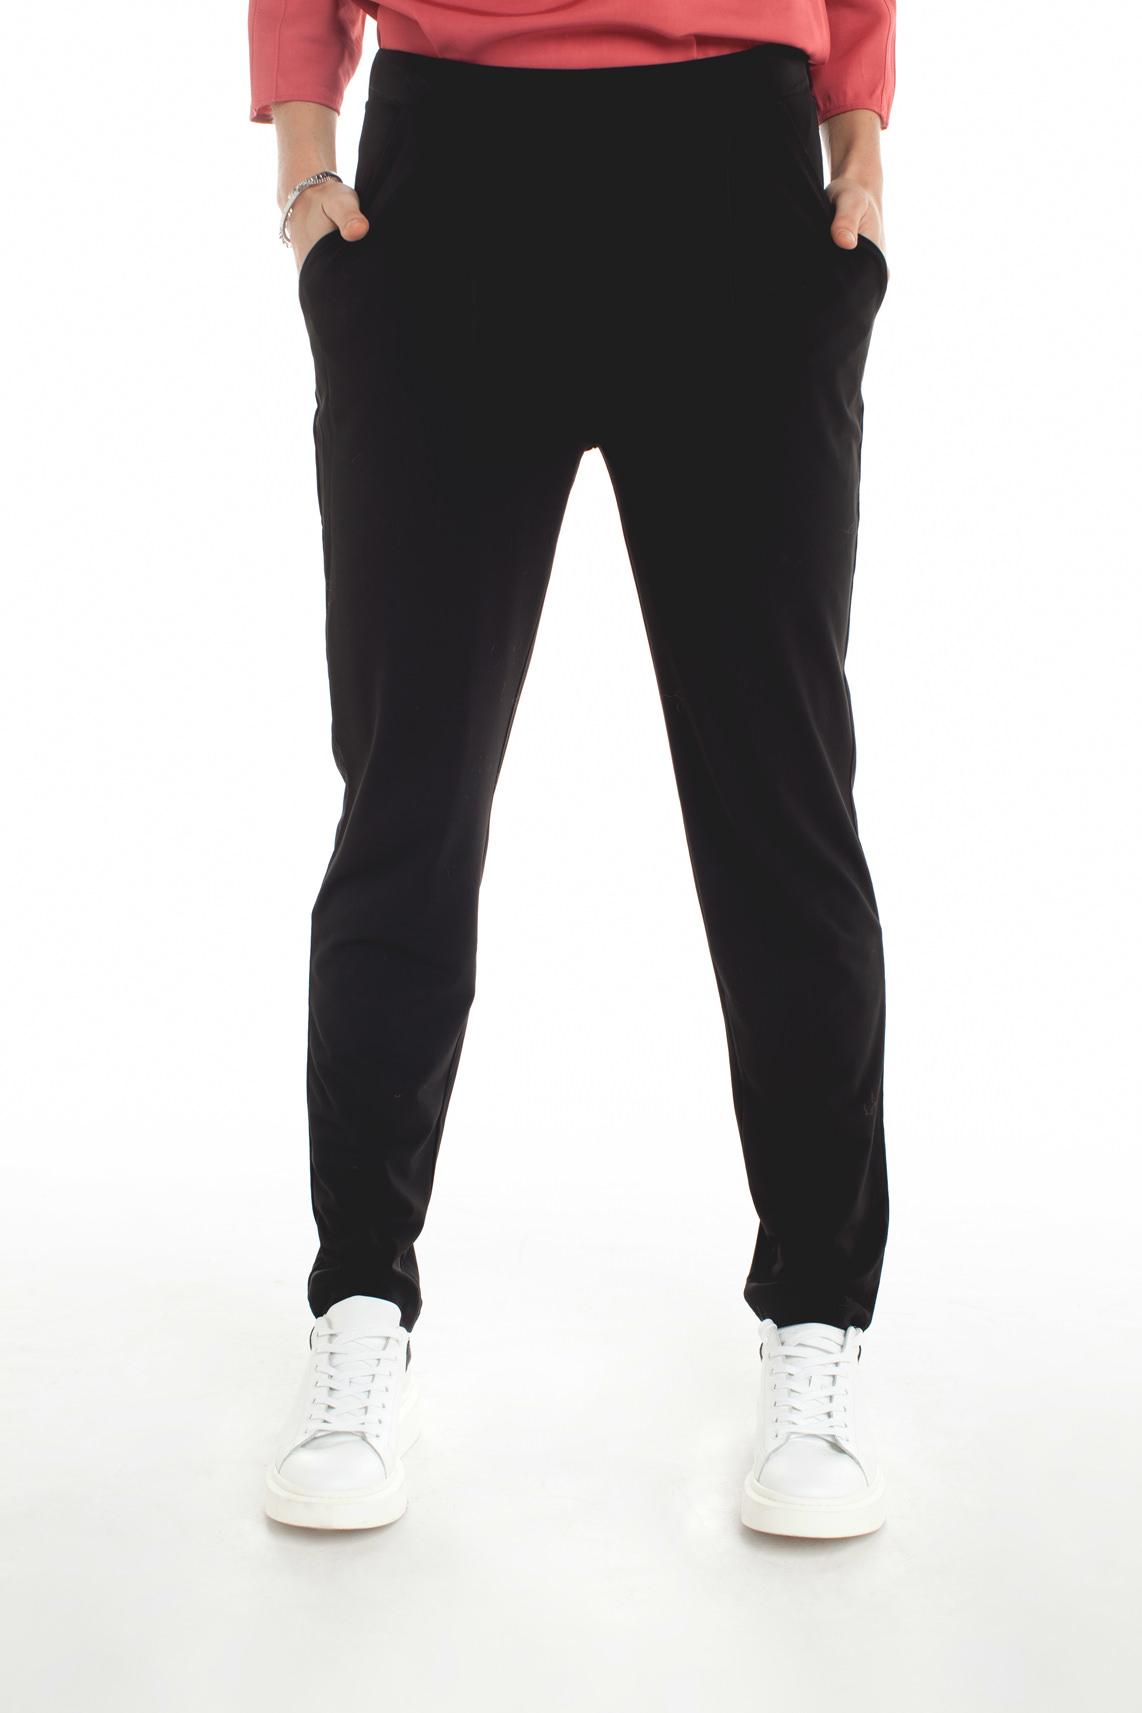 La Fée Maraboutée Dames Cropped broek zwart